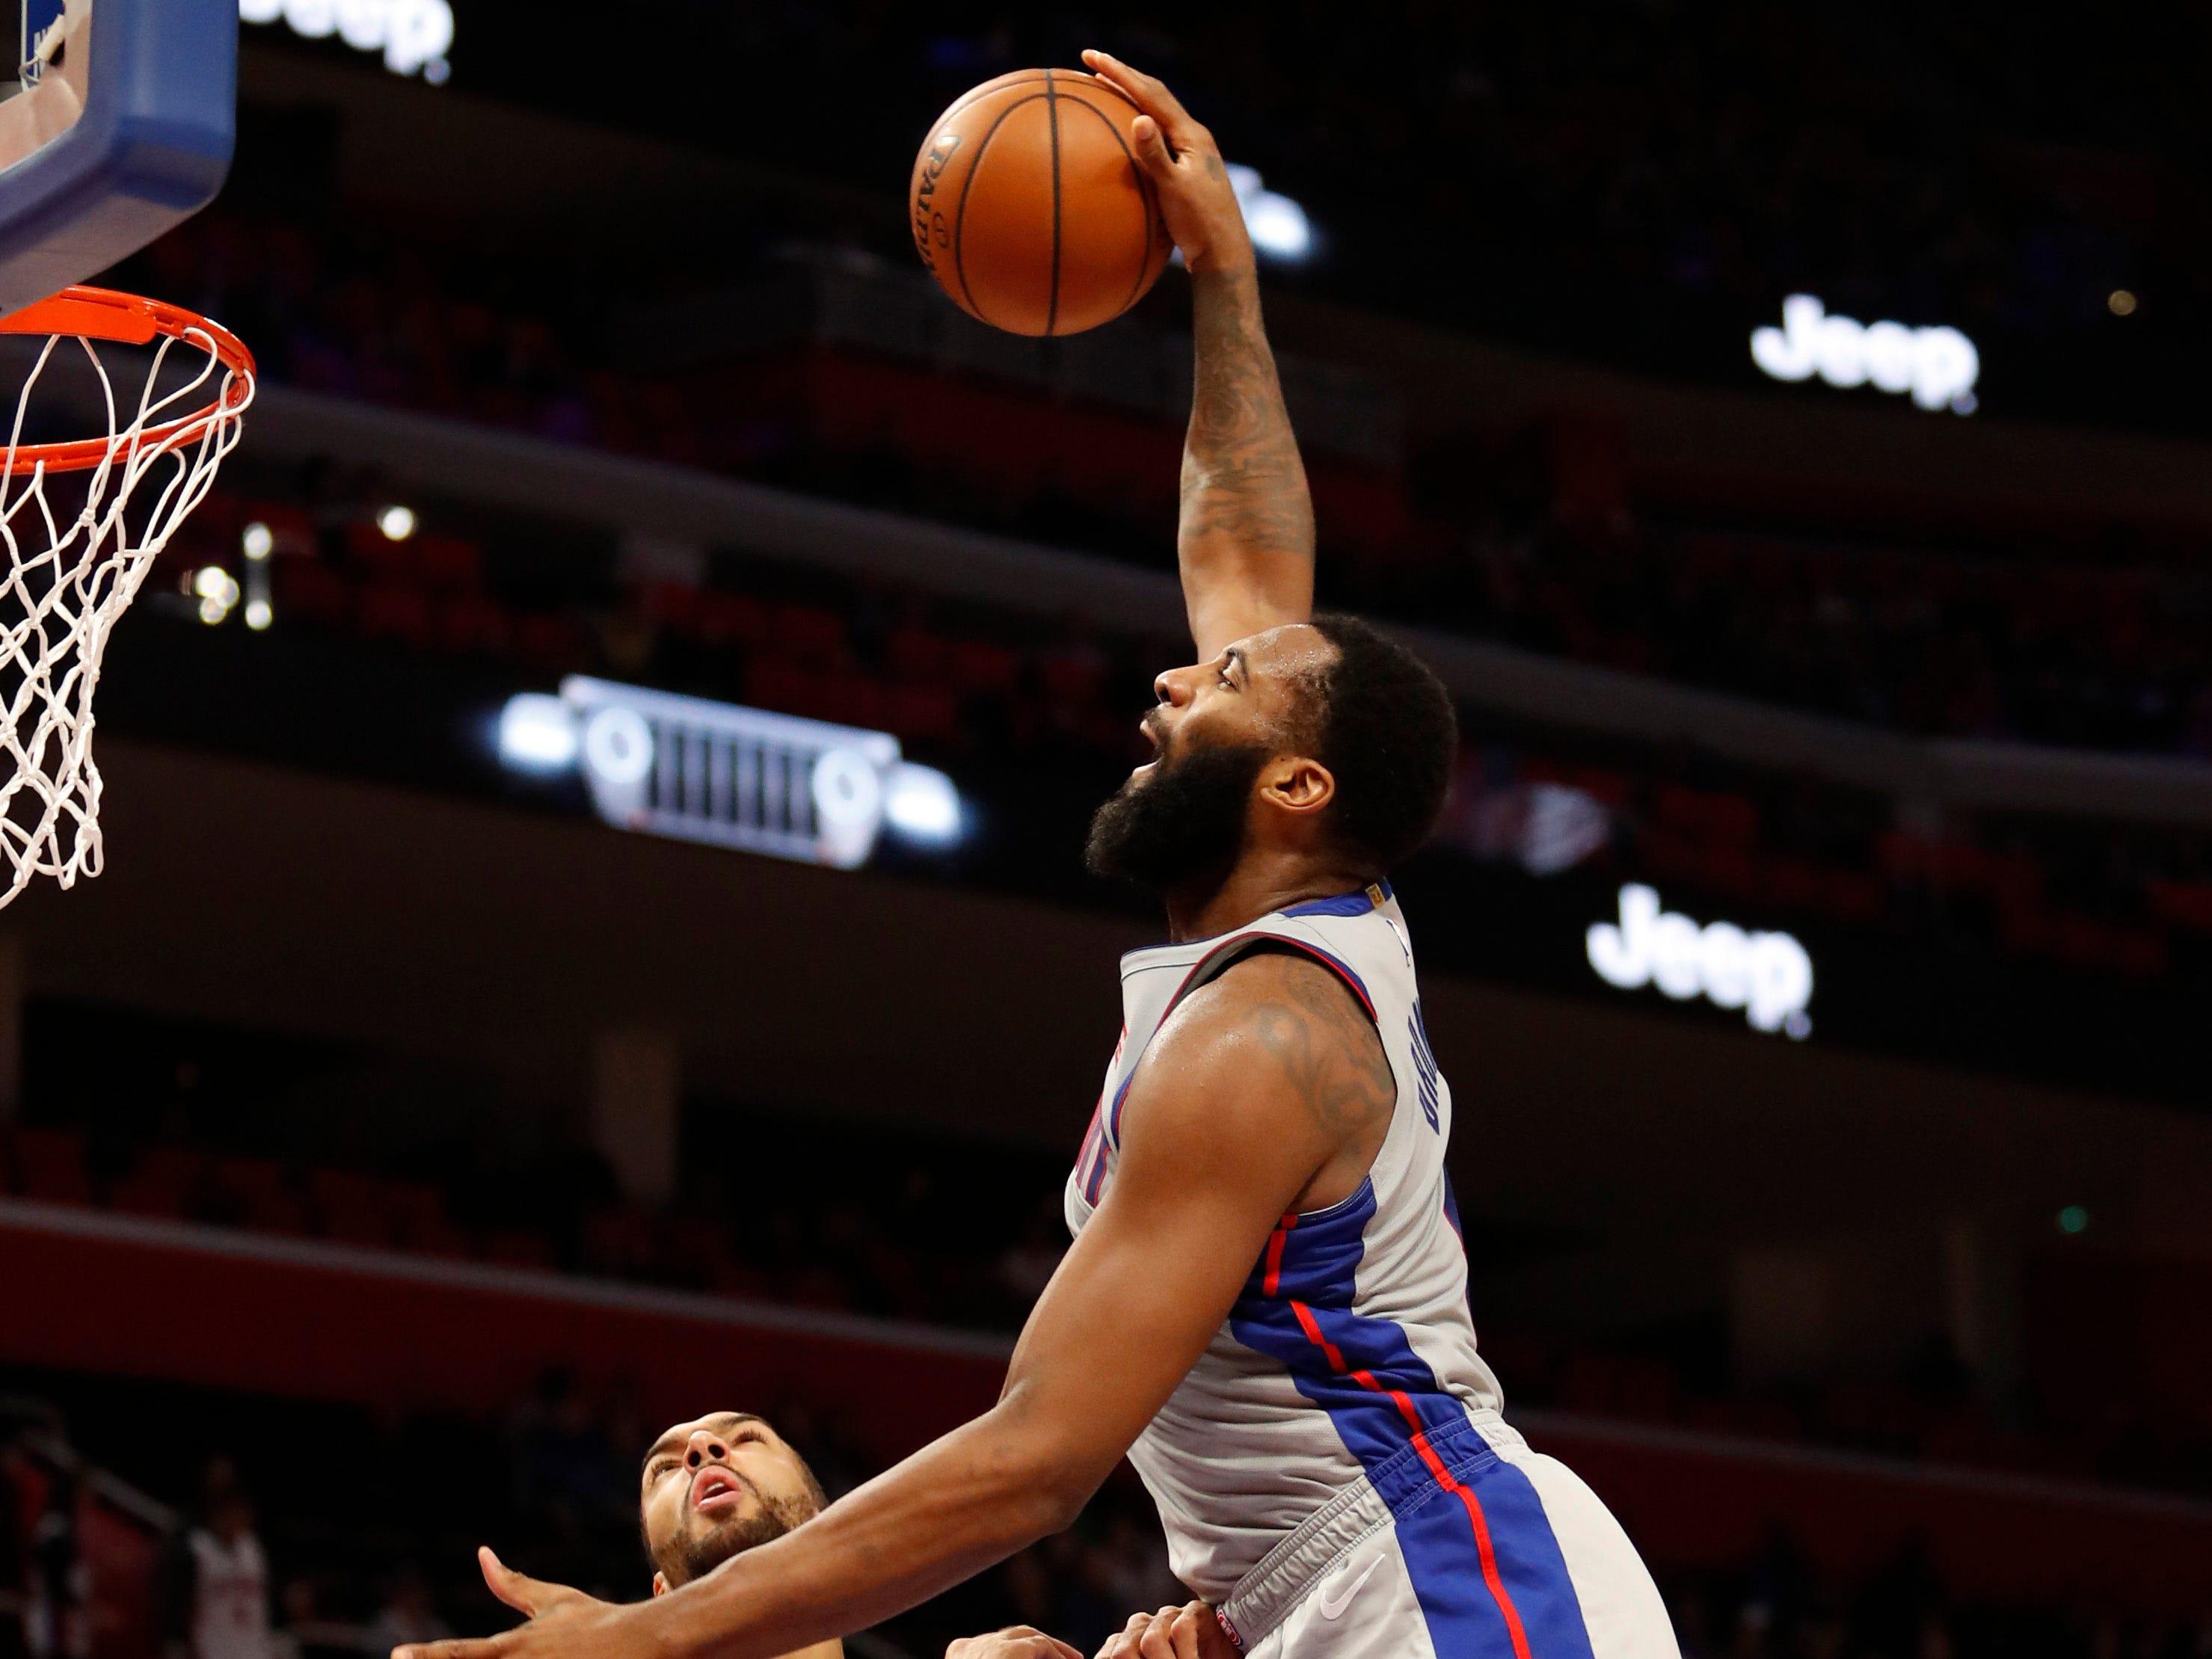 Jan. 5: Detroit Pistons center Andre Drummond dunks the ball against Utah Jazz center Rudy Gobert during the first quarter at Little Caesars Arena.